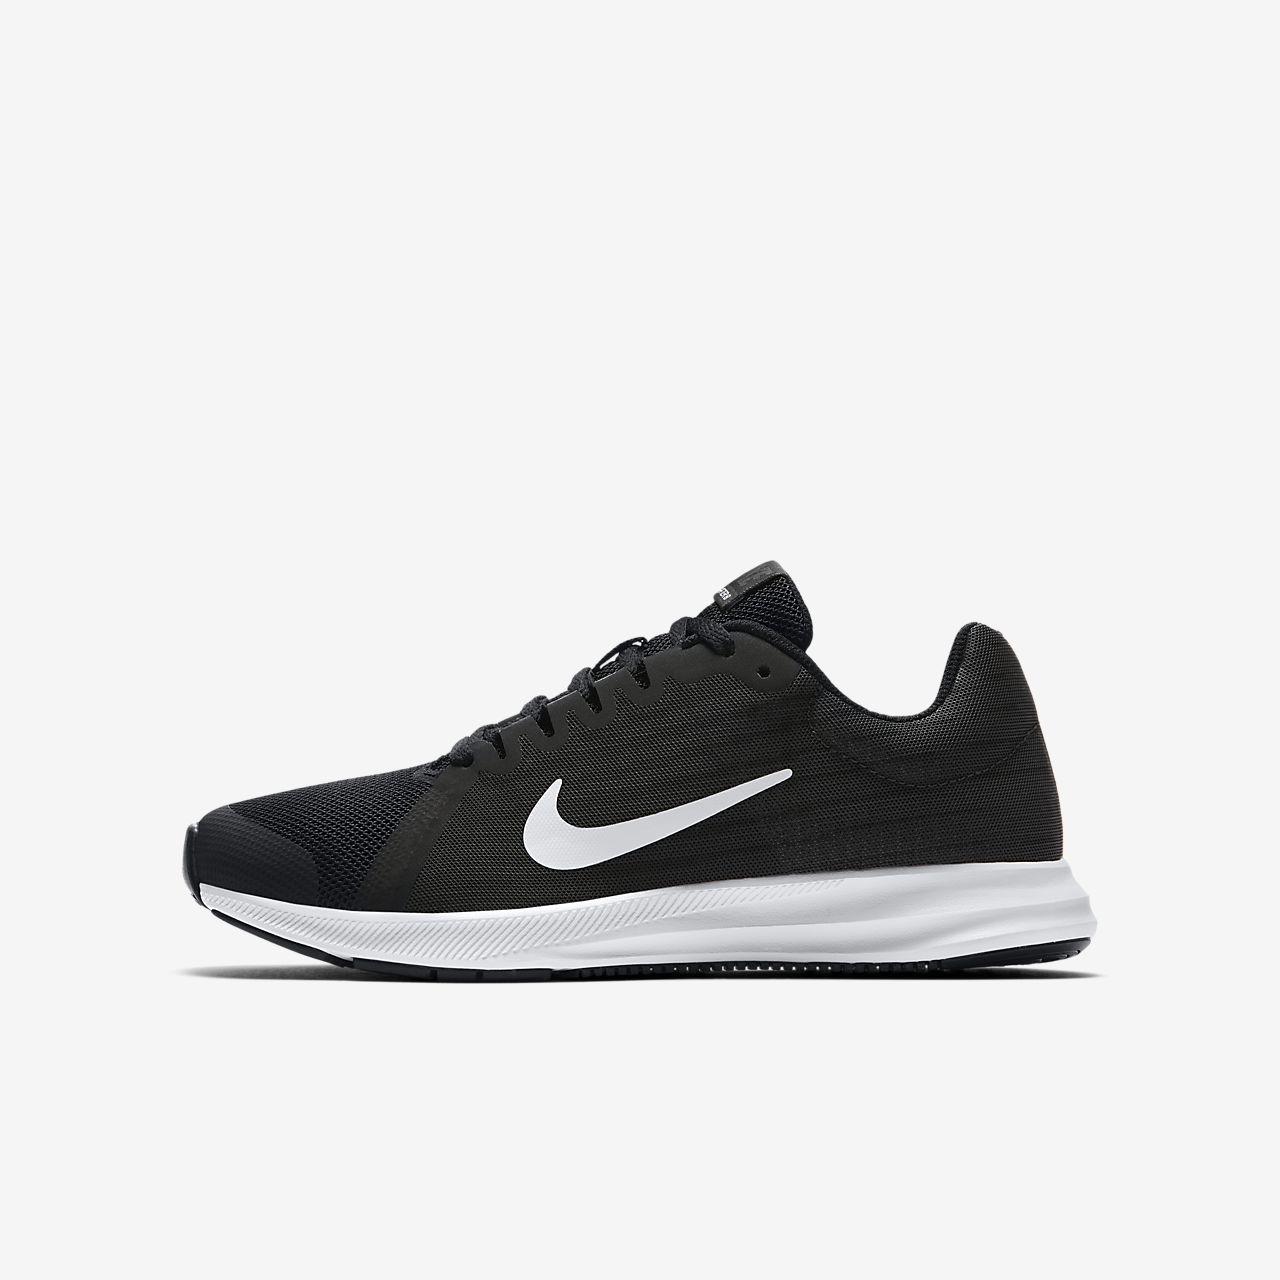 1d9e88d3addf Nike Downshifter 8 Older Kids  Running Shoe. Nike.com SI